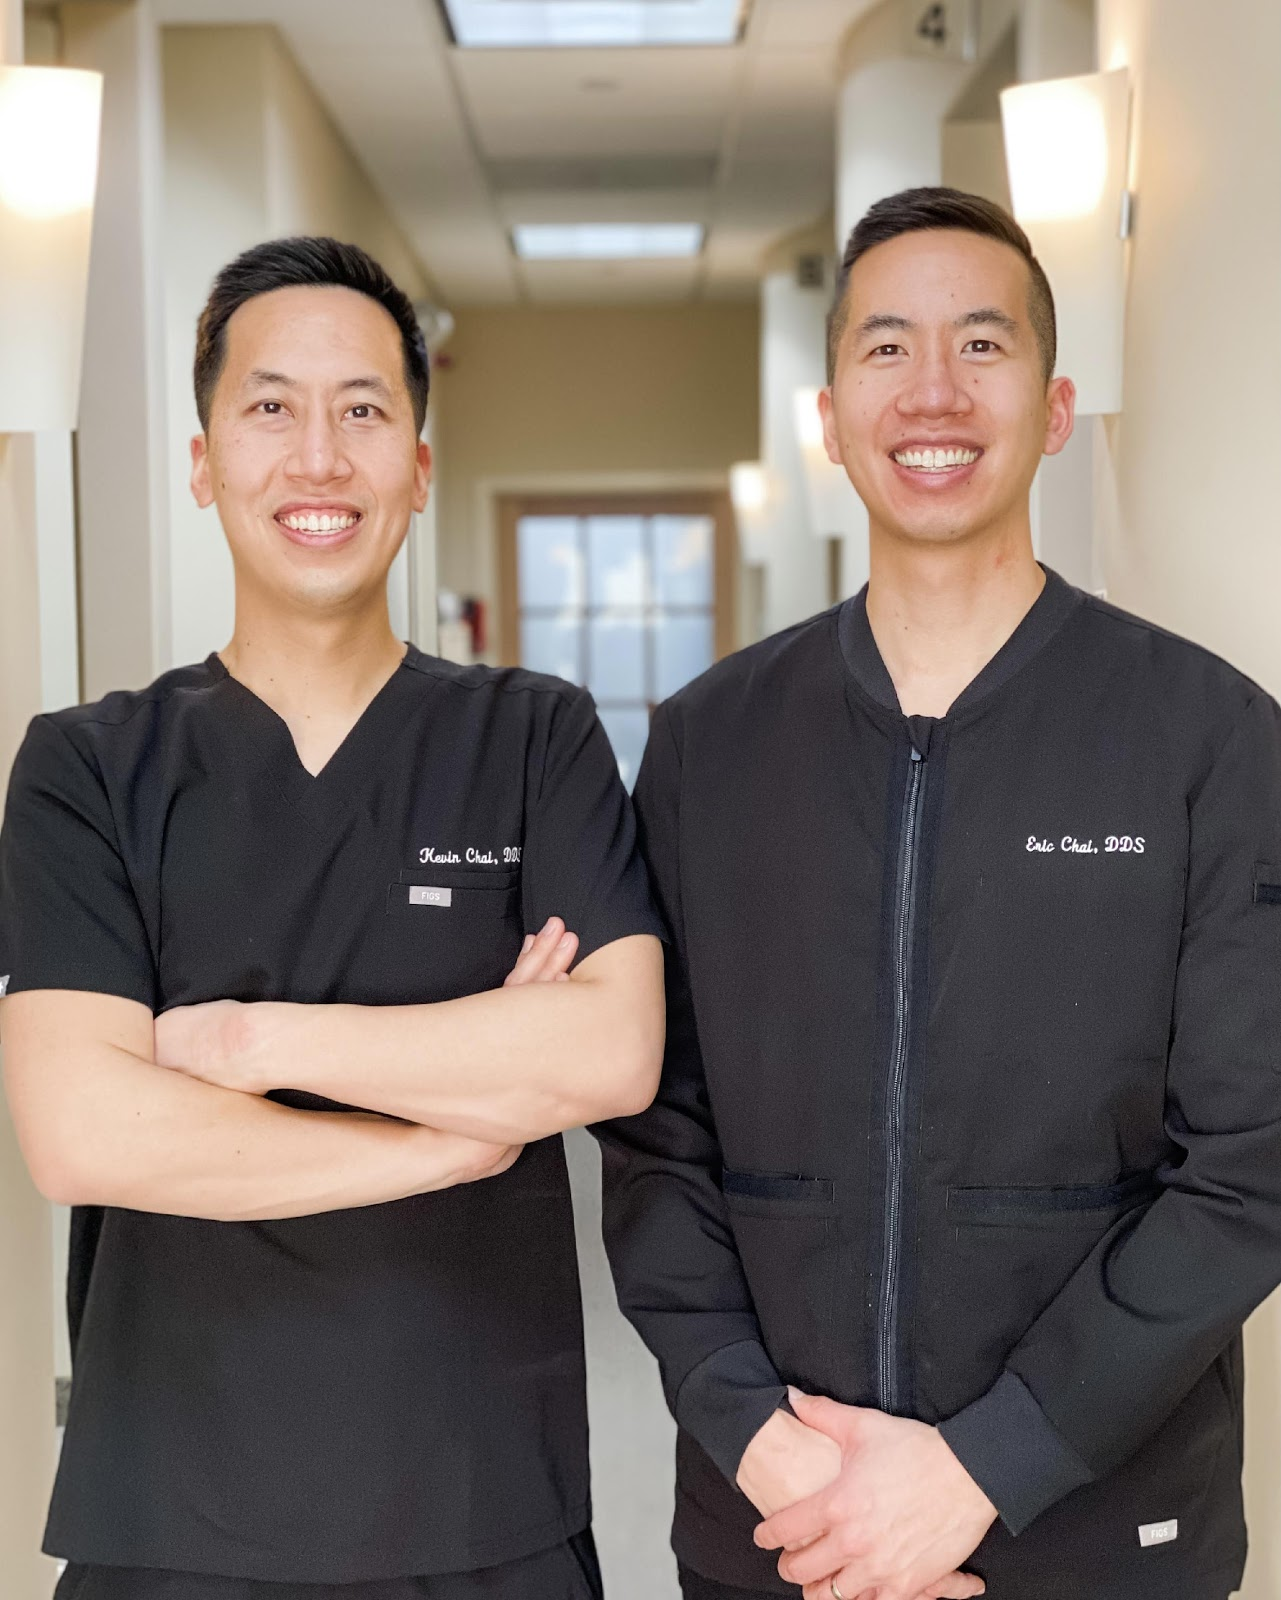 Drs. Eric & Kevin Chai